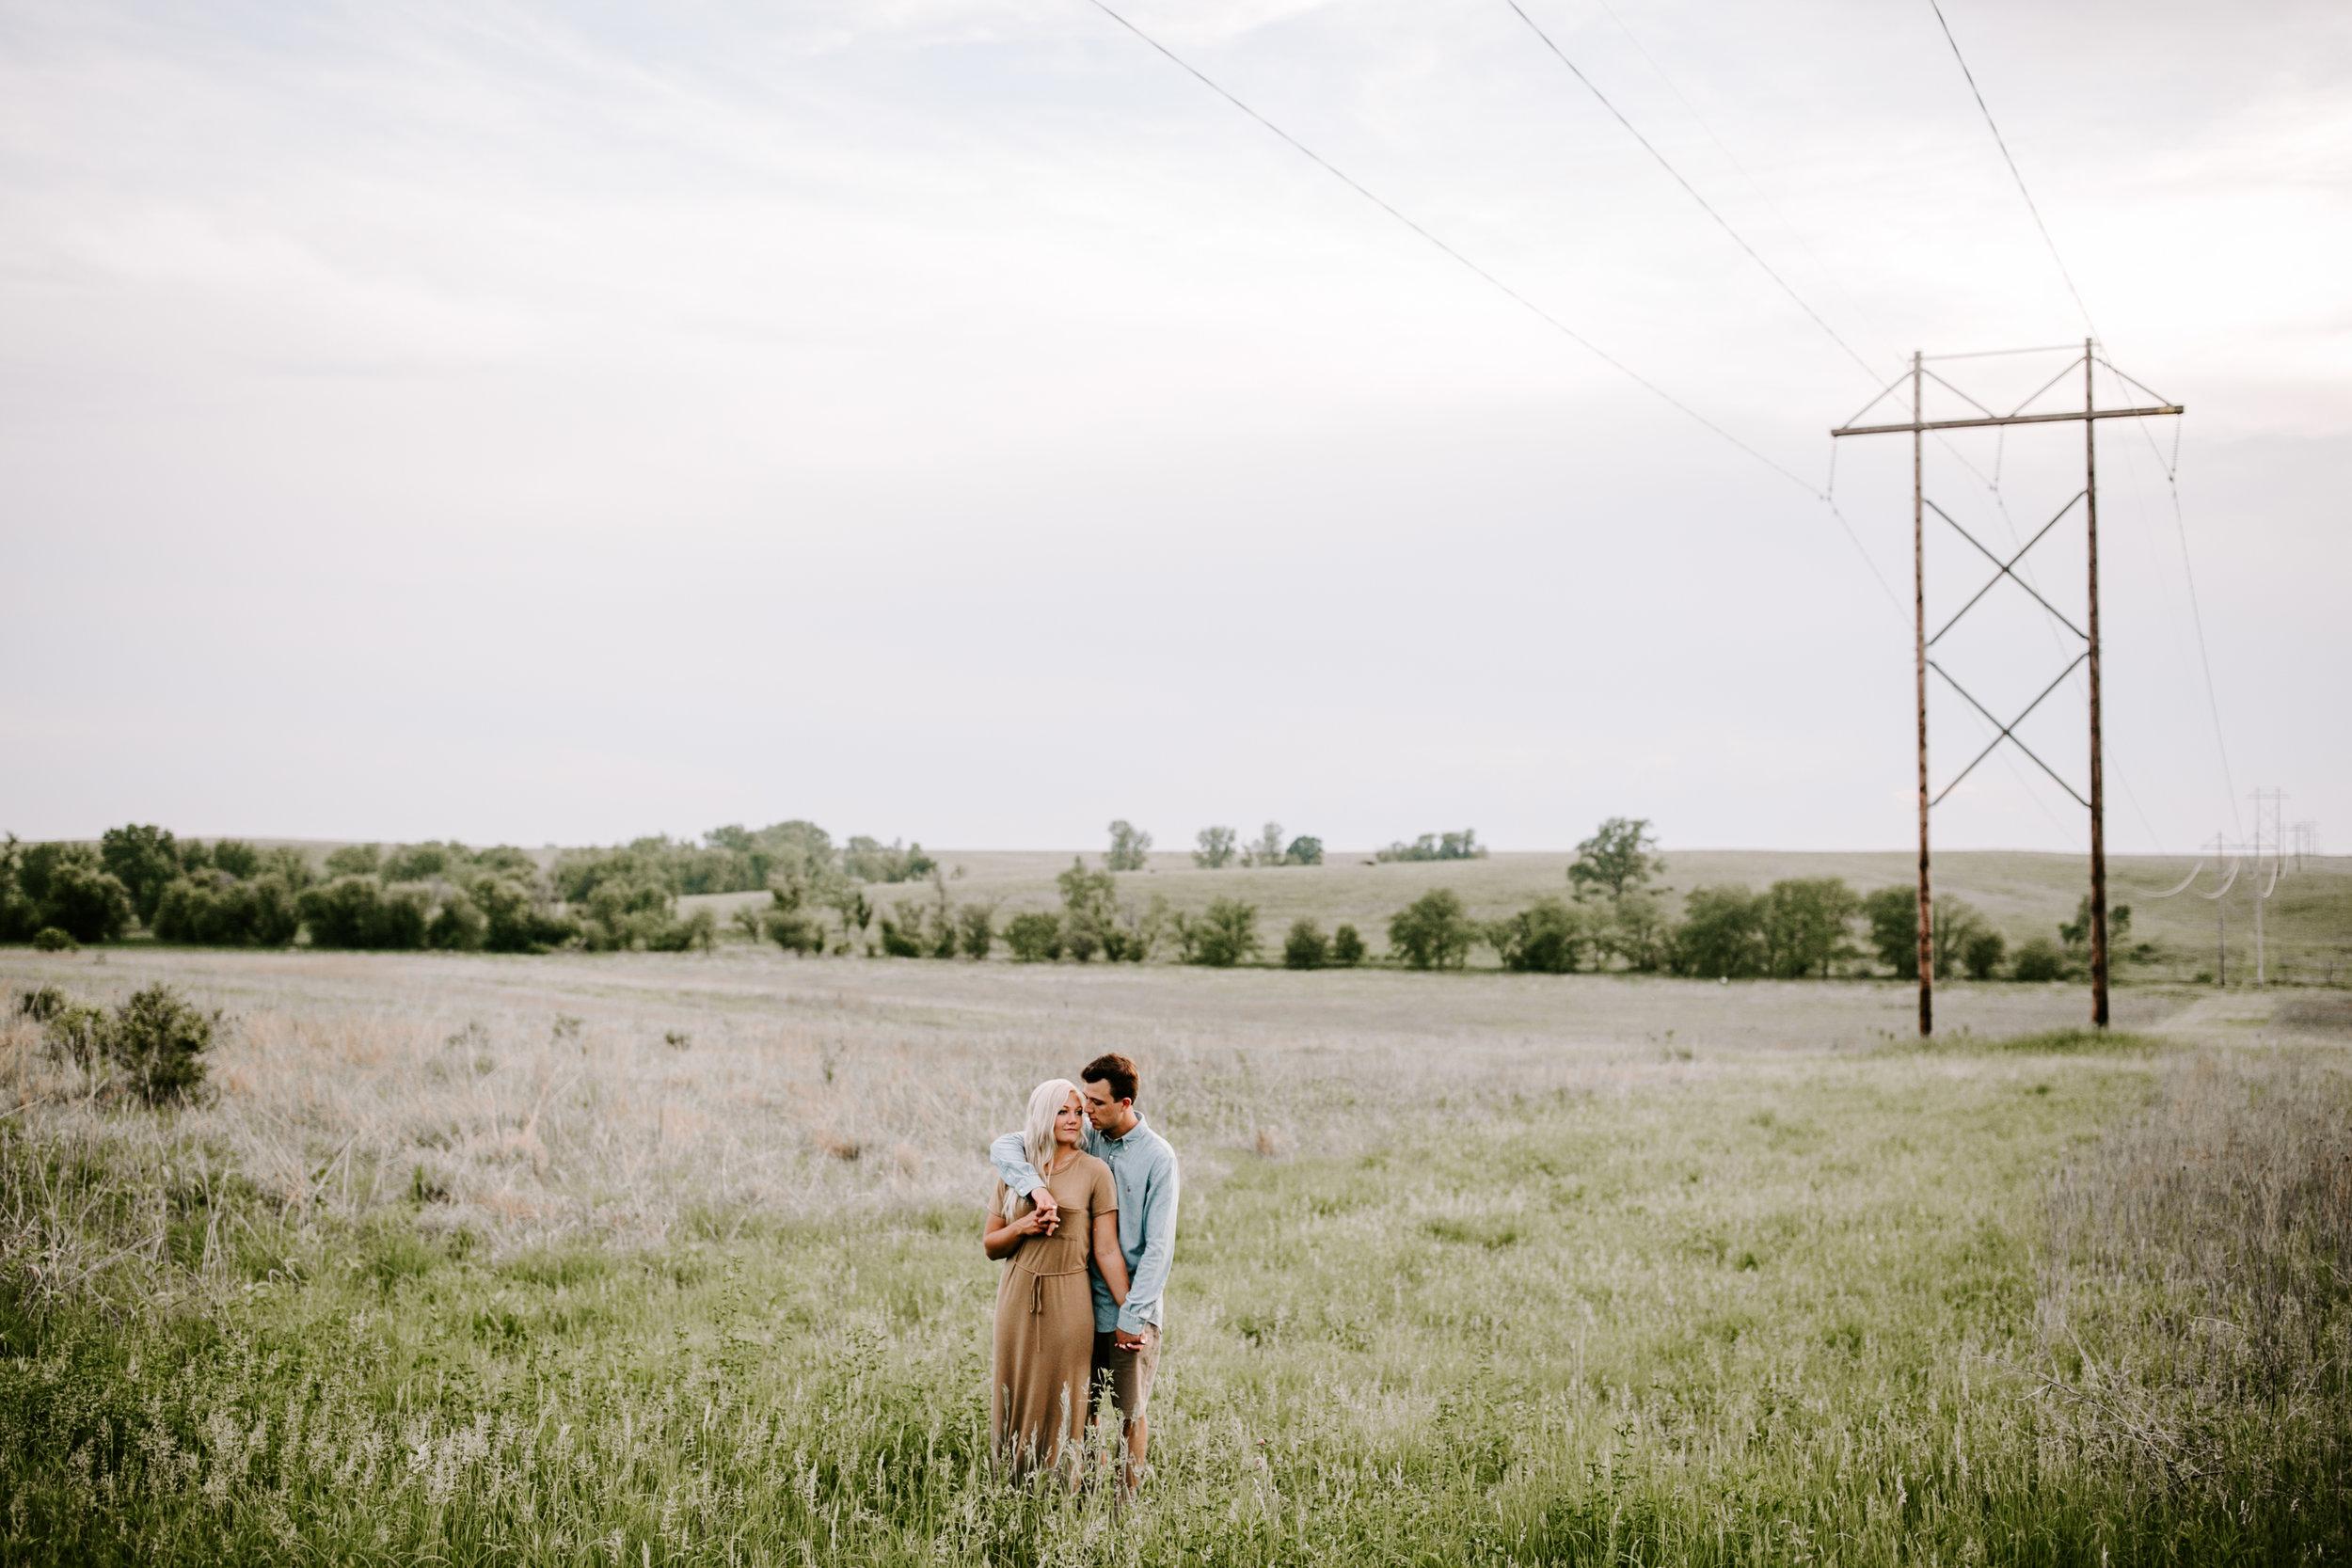 gracetphotography-adventure-session-des-moines-iowa-wedding-photographer-30.jpg